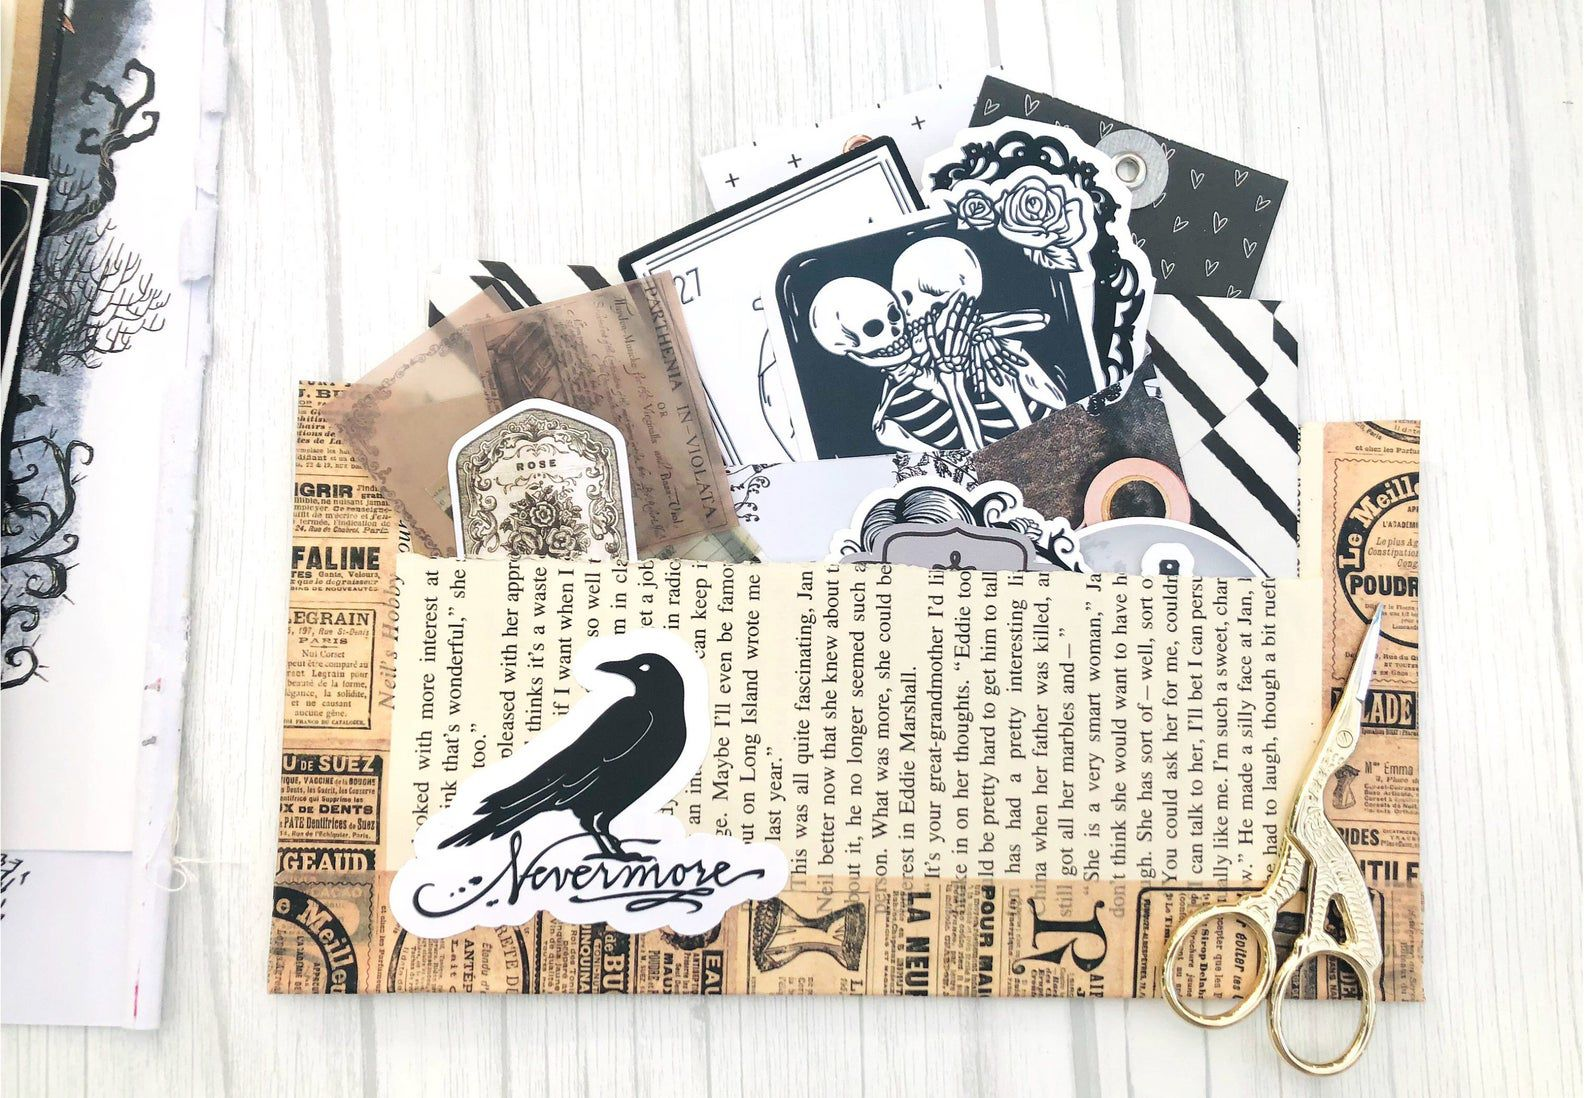 Image of gothic ephemera, including ravens, skulls, and vintage paper.